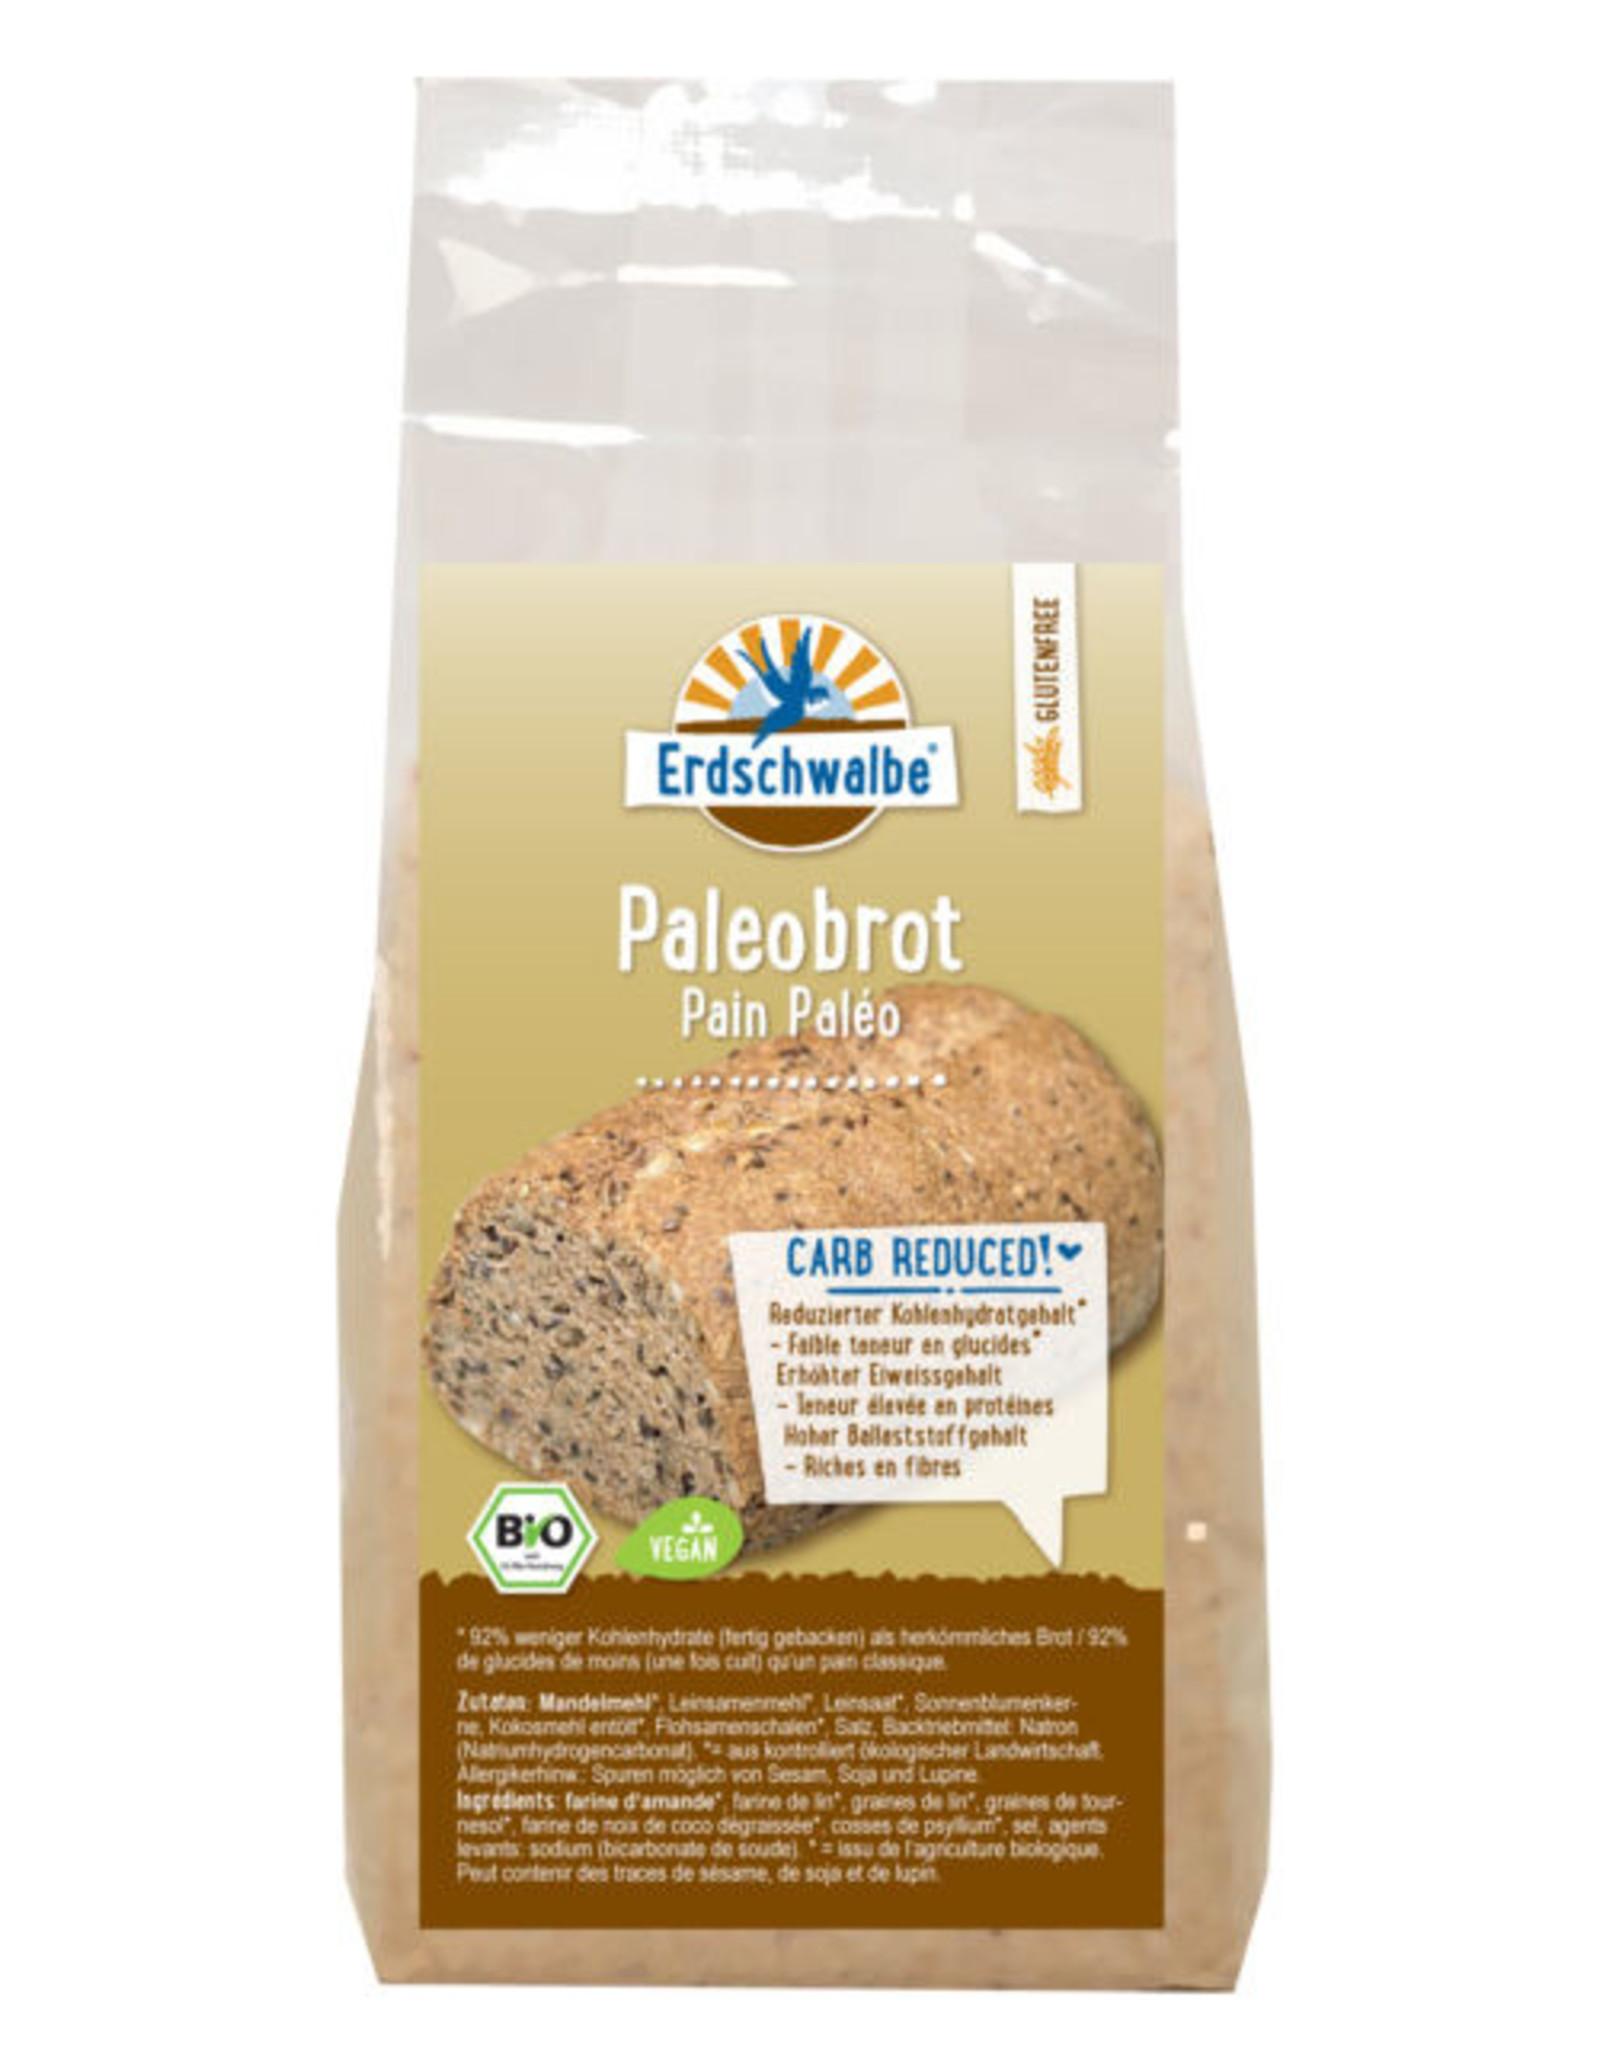 Erdschwalbe Paleo Brot Backmischung 300g